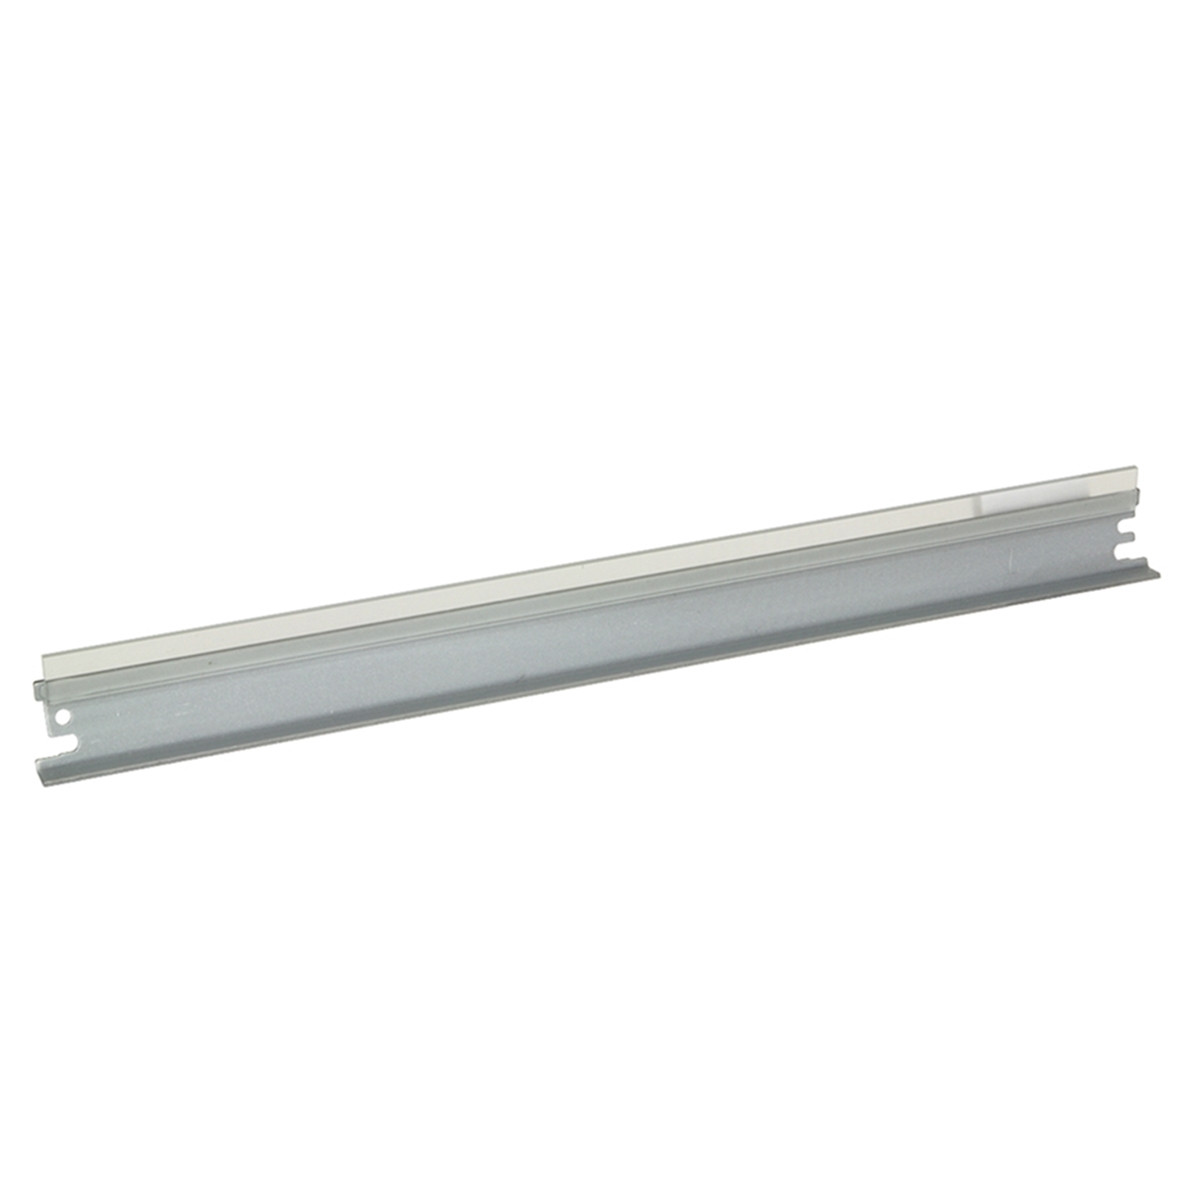 Lâmina de Limpeza ou Wiper Blade Samsung D111S D111 | M2020 M2070 M2020FW M2070W M2070FW